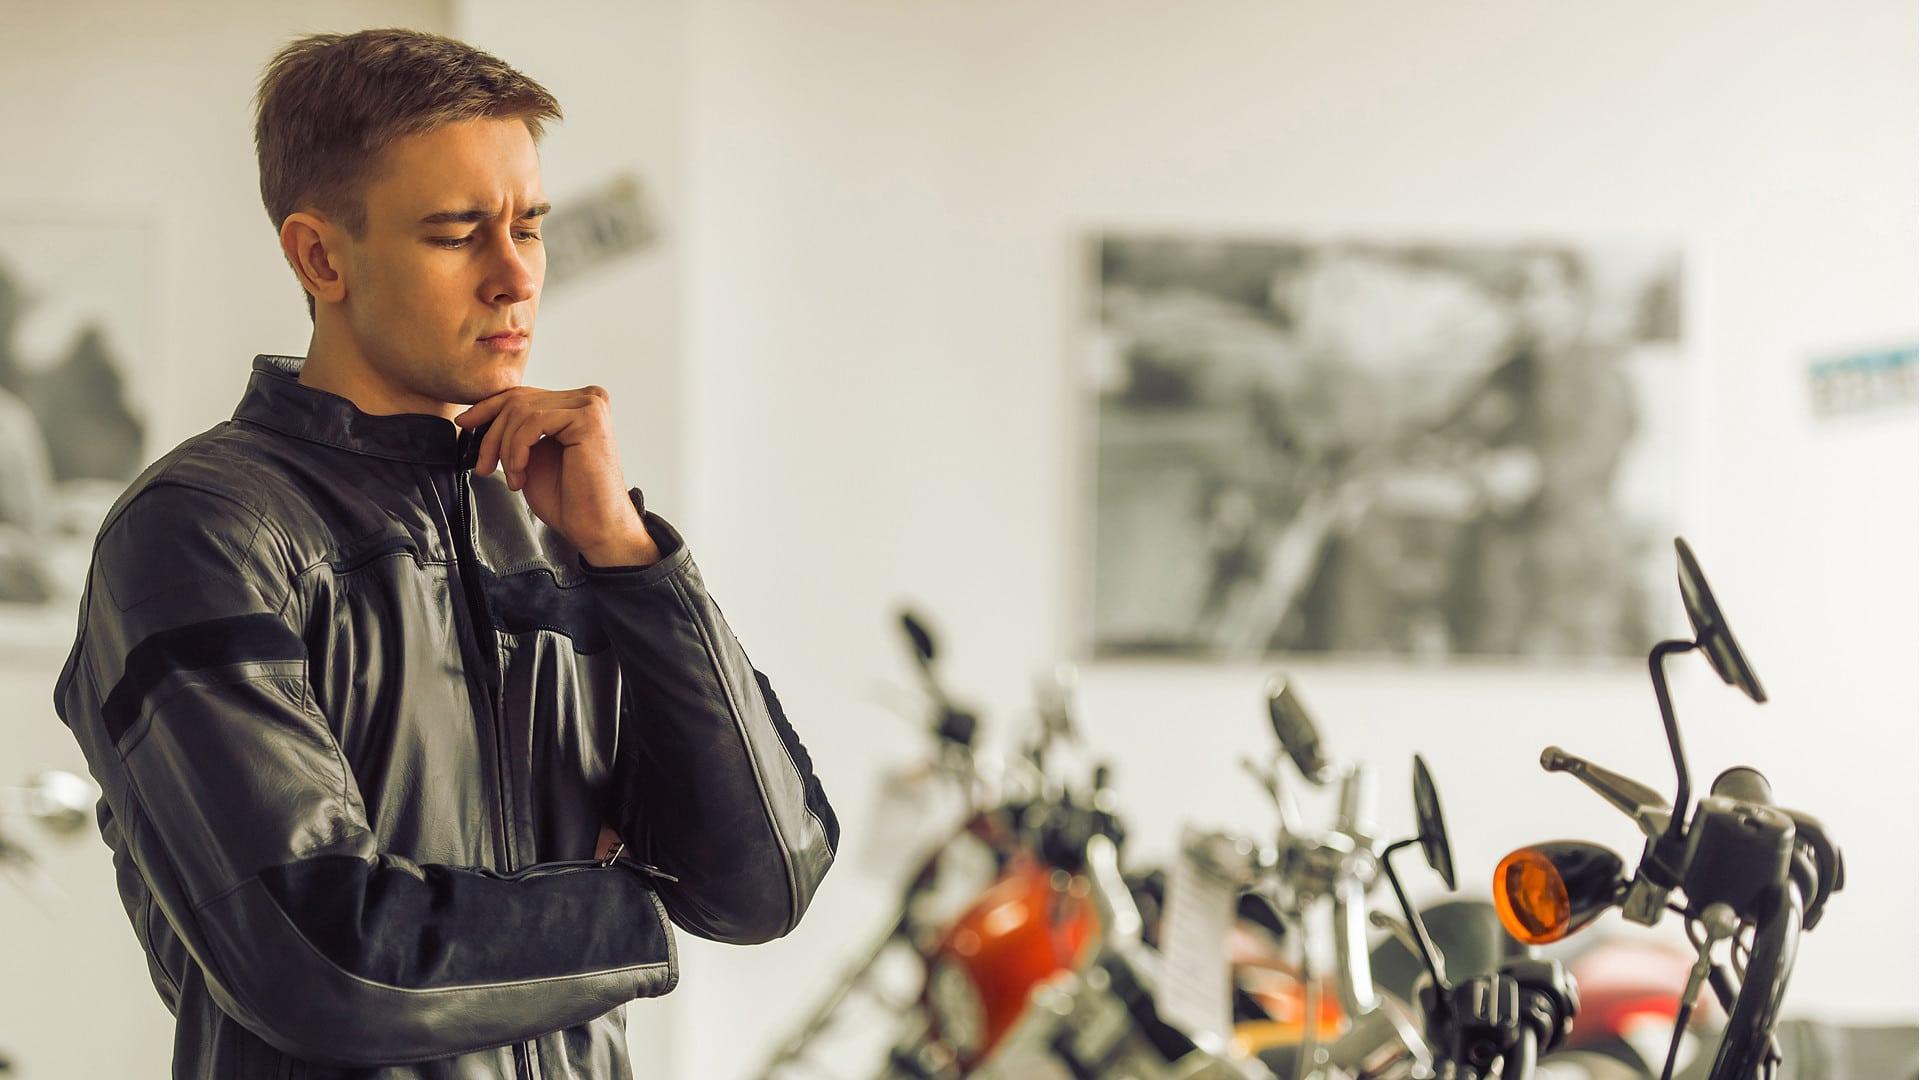 Man thinking and choosing a motorcycle